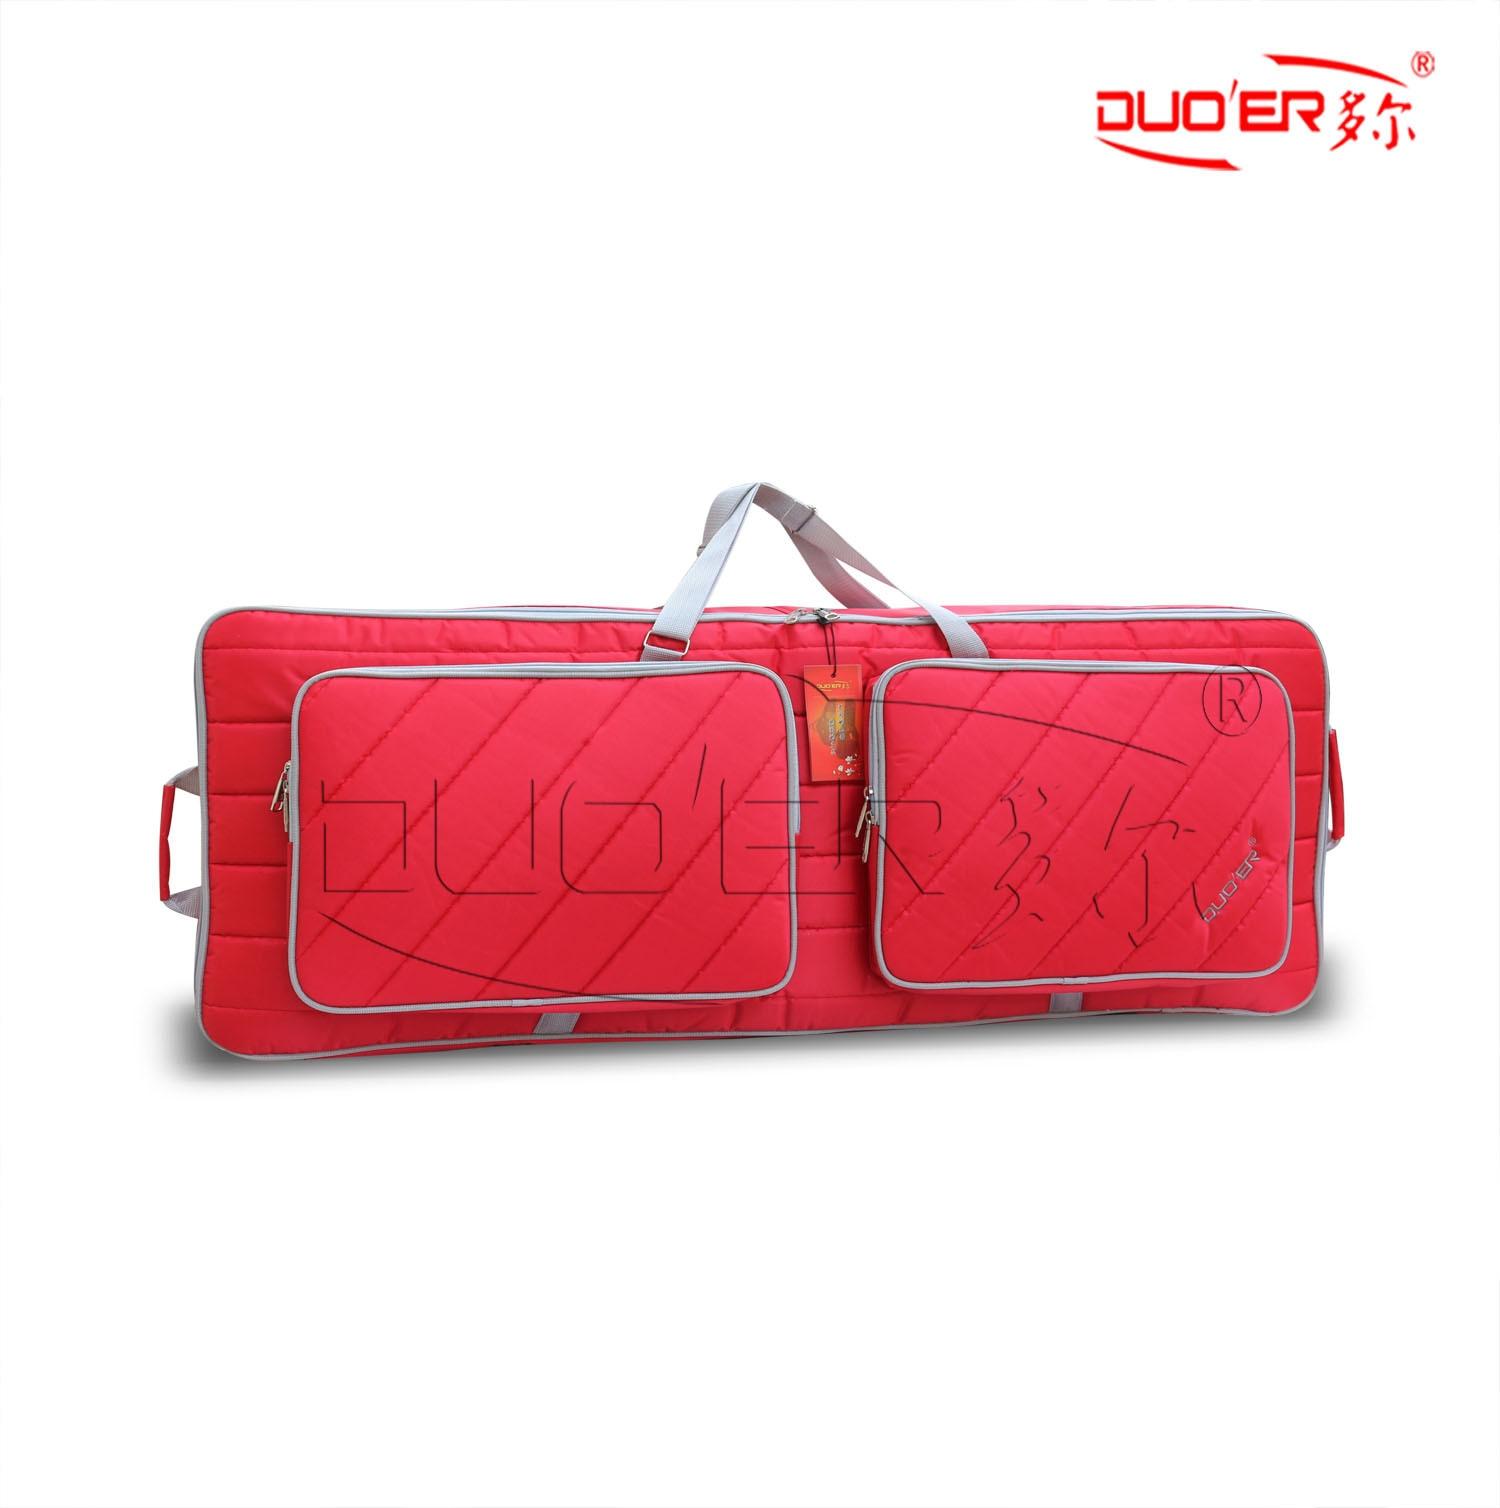 Duoer Electronic Keyboard Bag 61 Keys 76 Keys Keyboard Bags Waterproof Thick Stripe Style Factory Wholesal Customize Bags enlarge